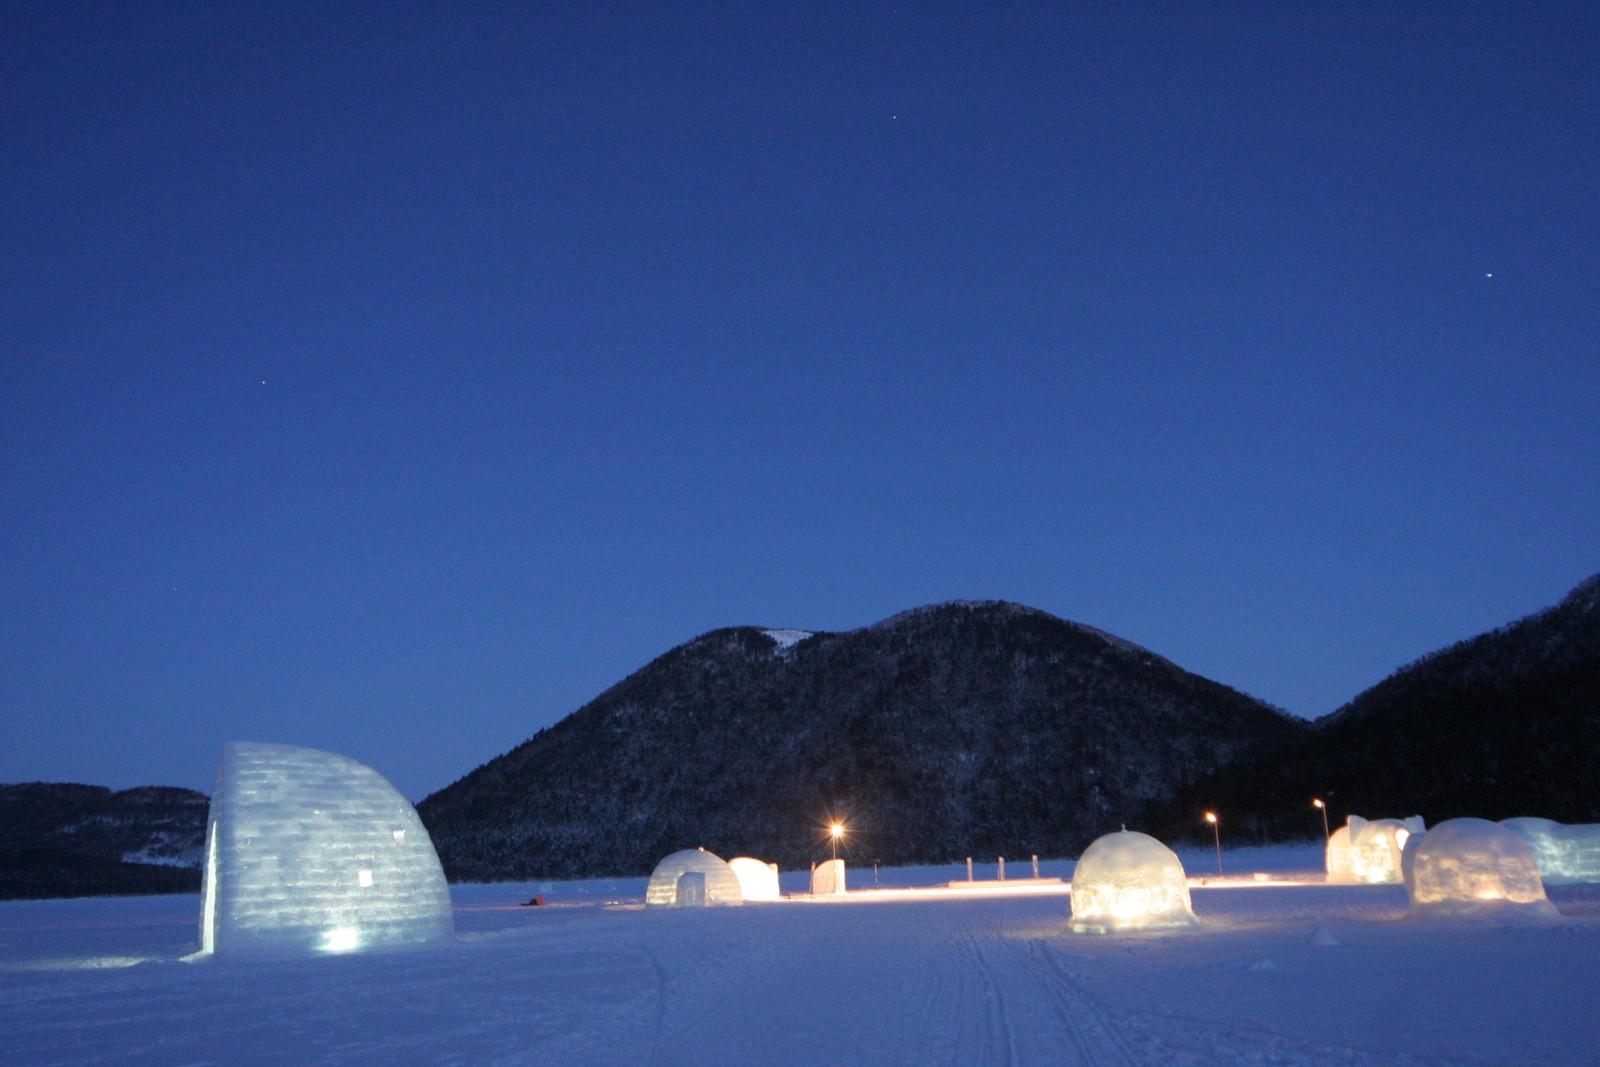 Lake Shikaribetsu Kotan 2020 Ice Village In Hokkaido